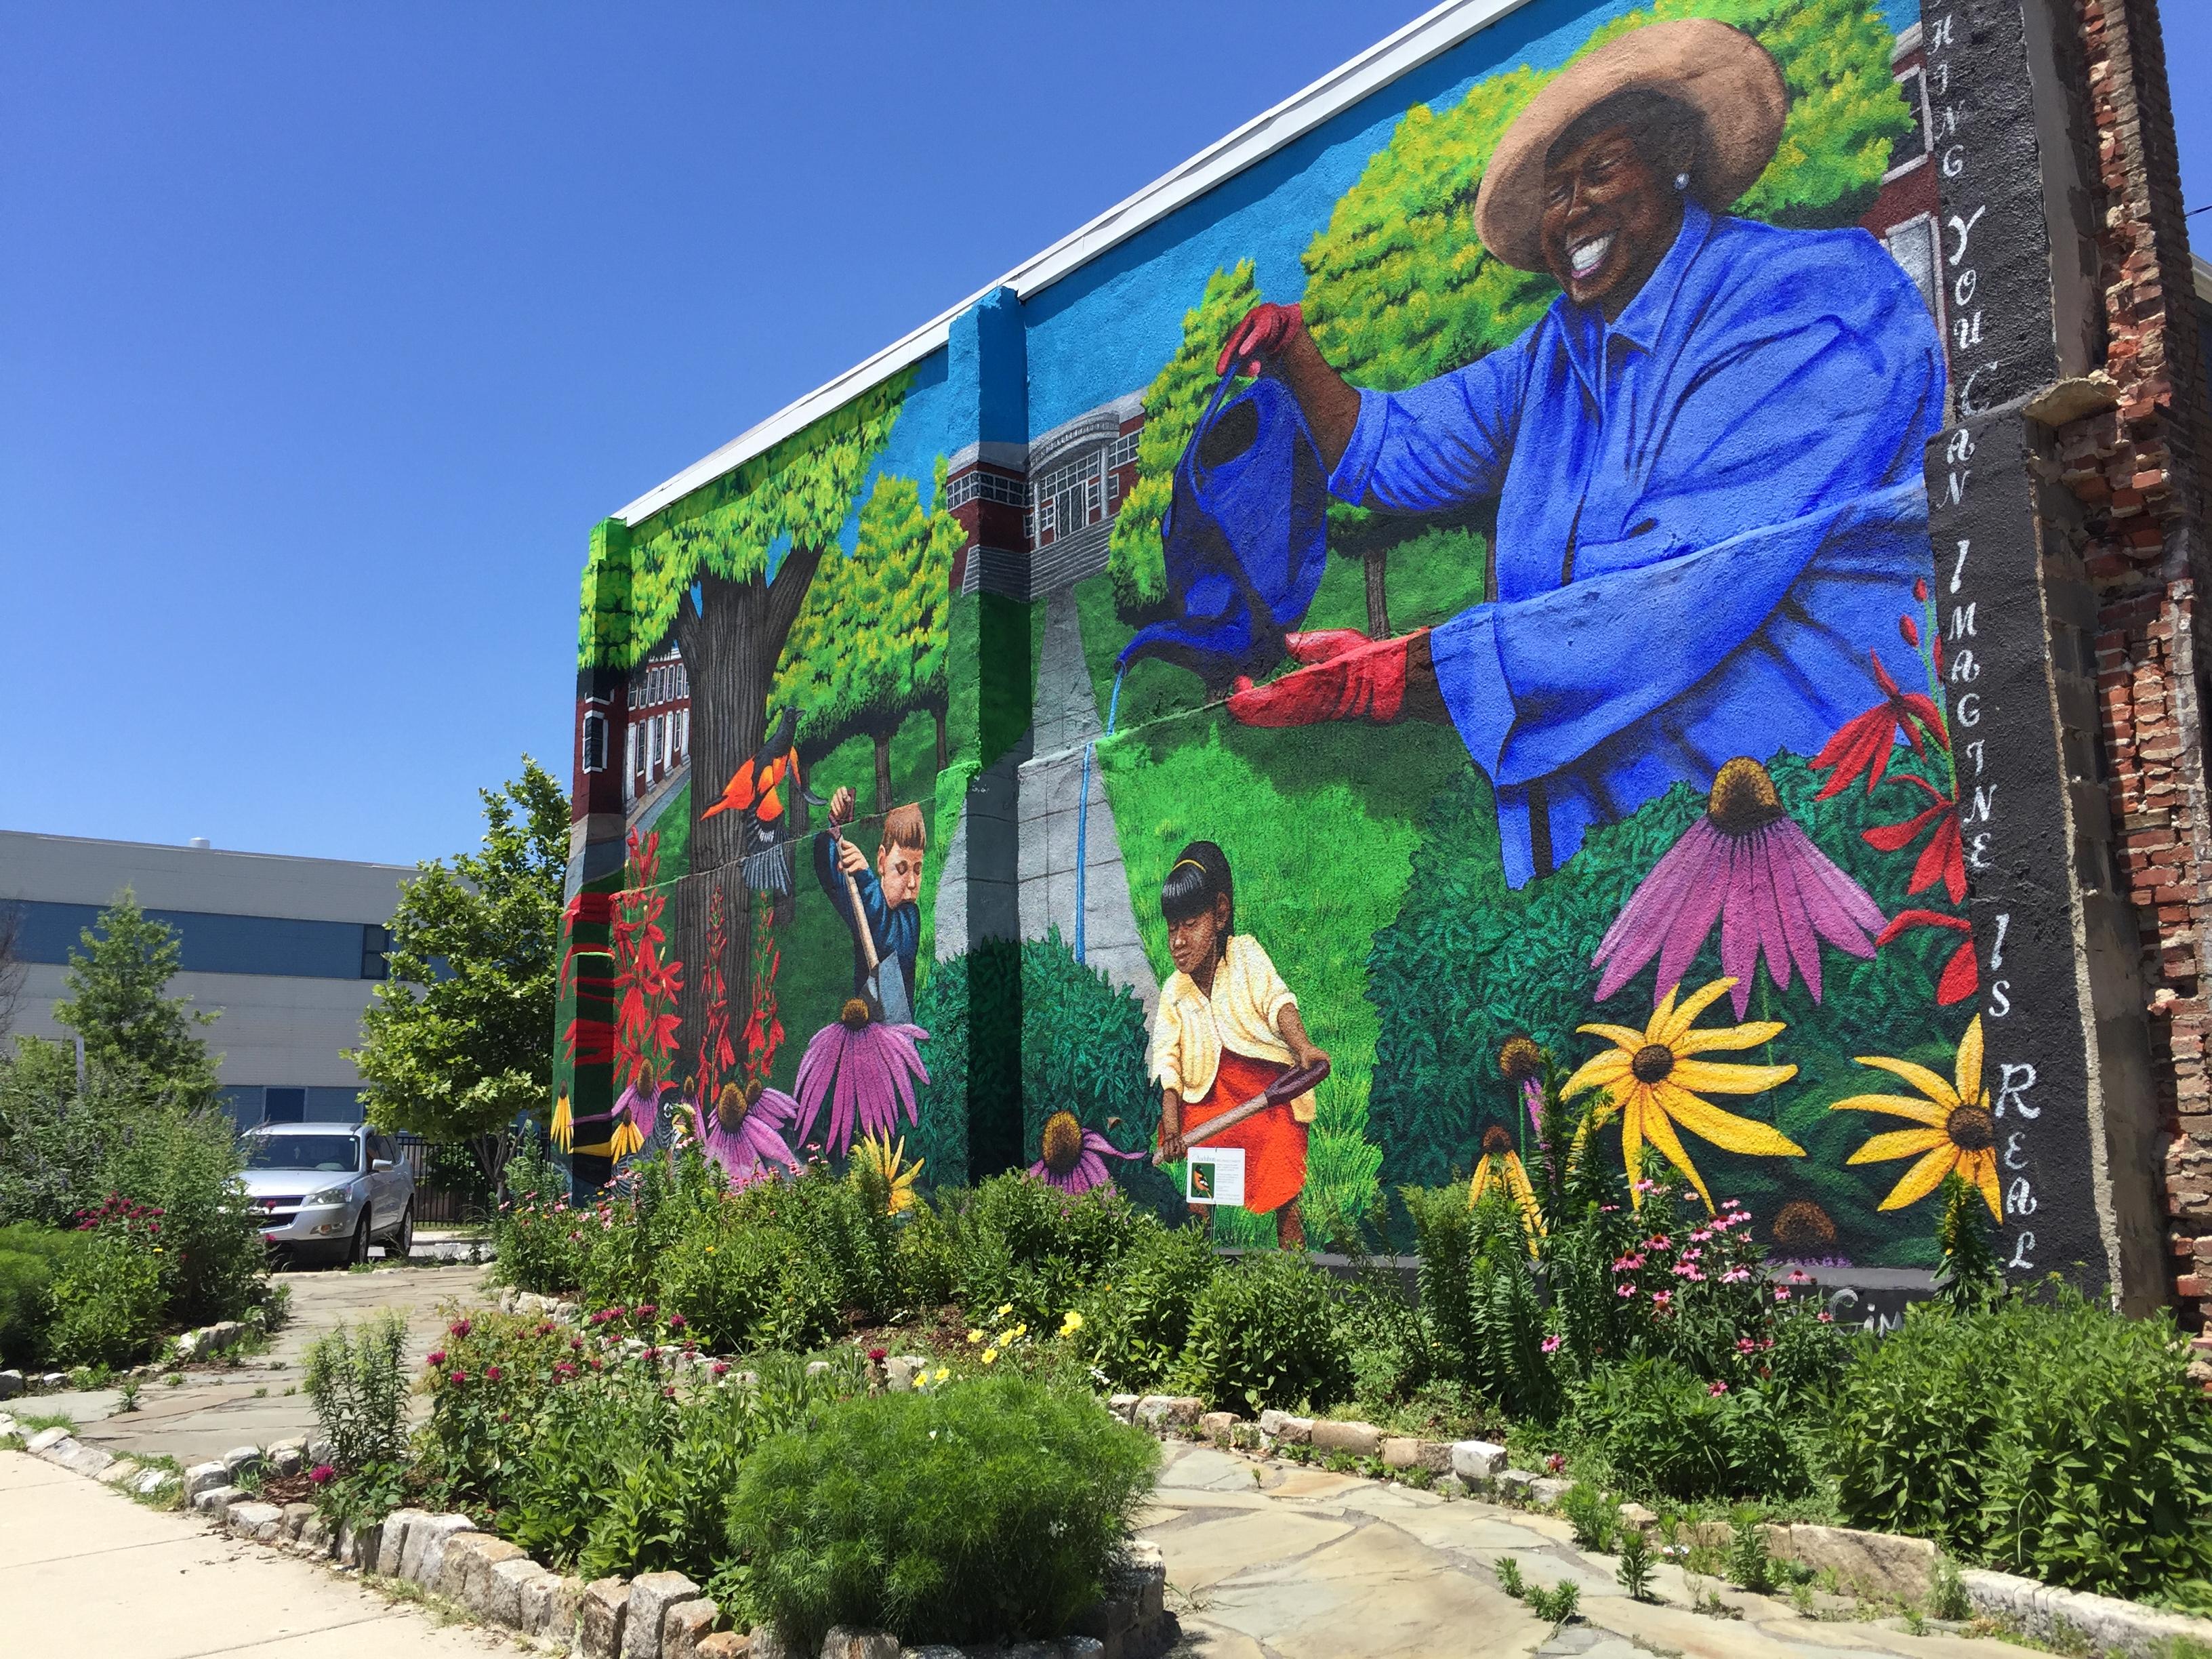 Mural Garden in Baltimore